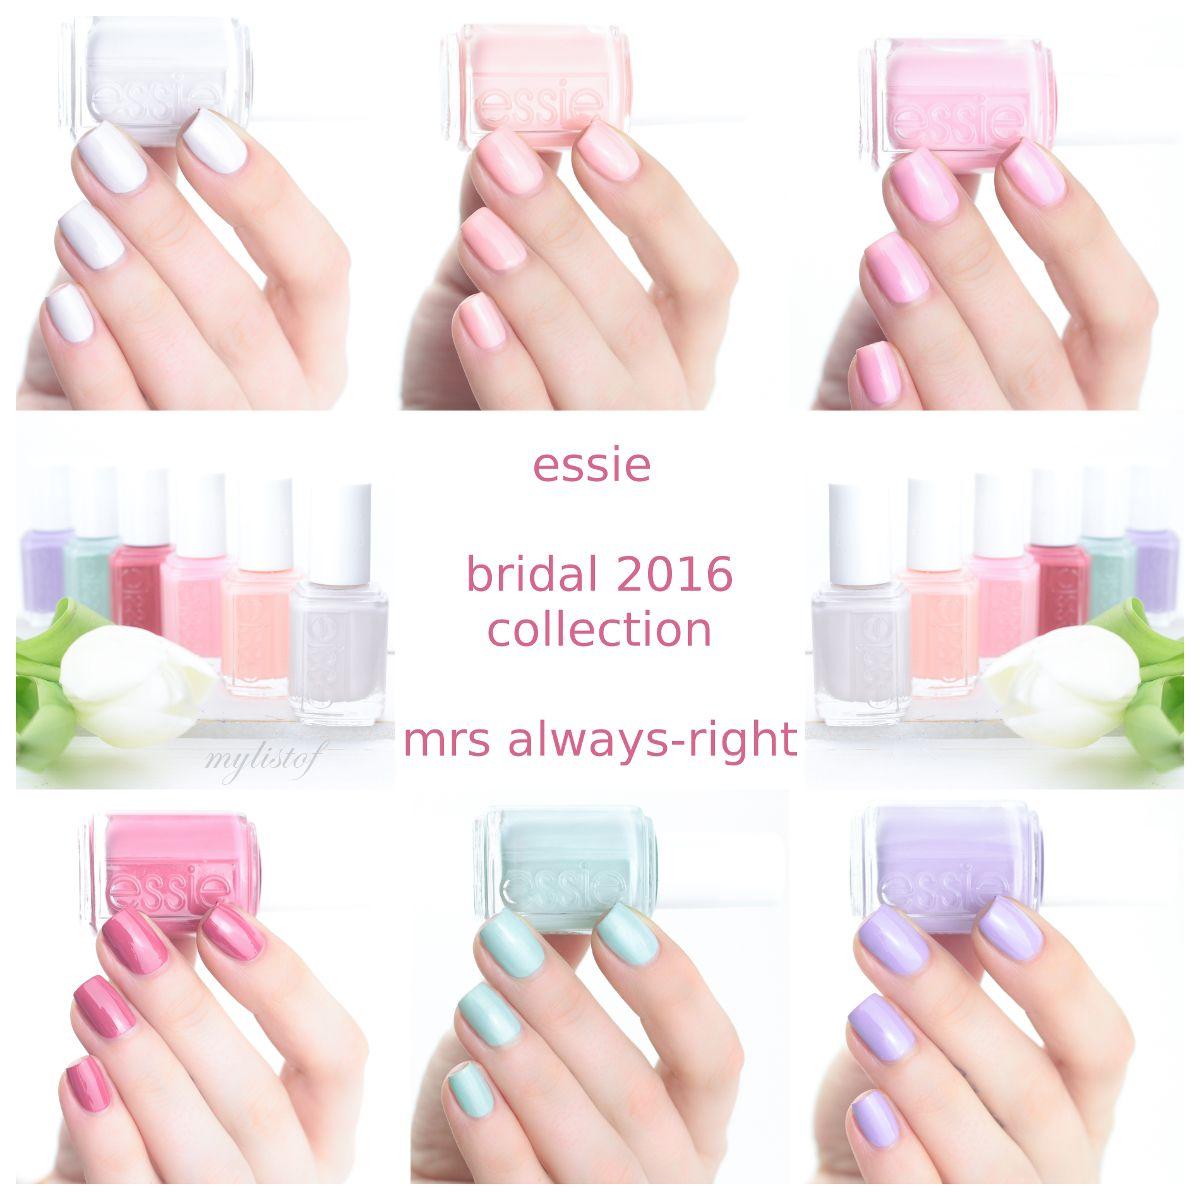 essie bridal 2016 collection mrs always right